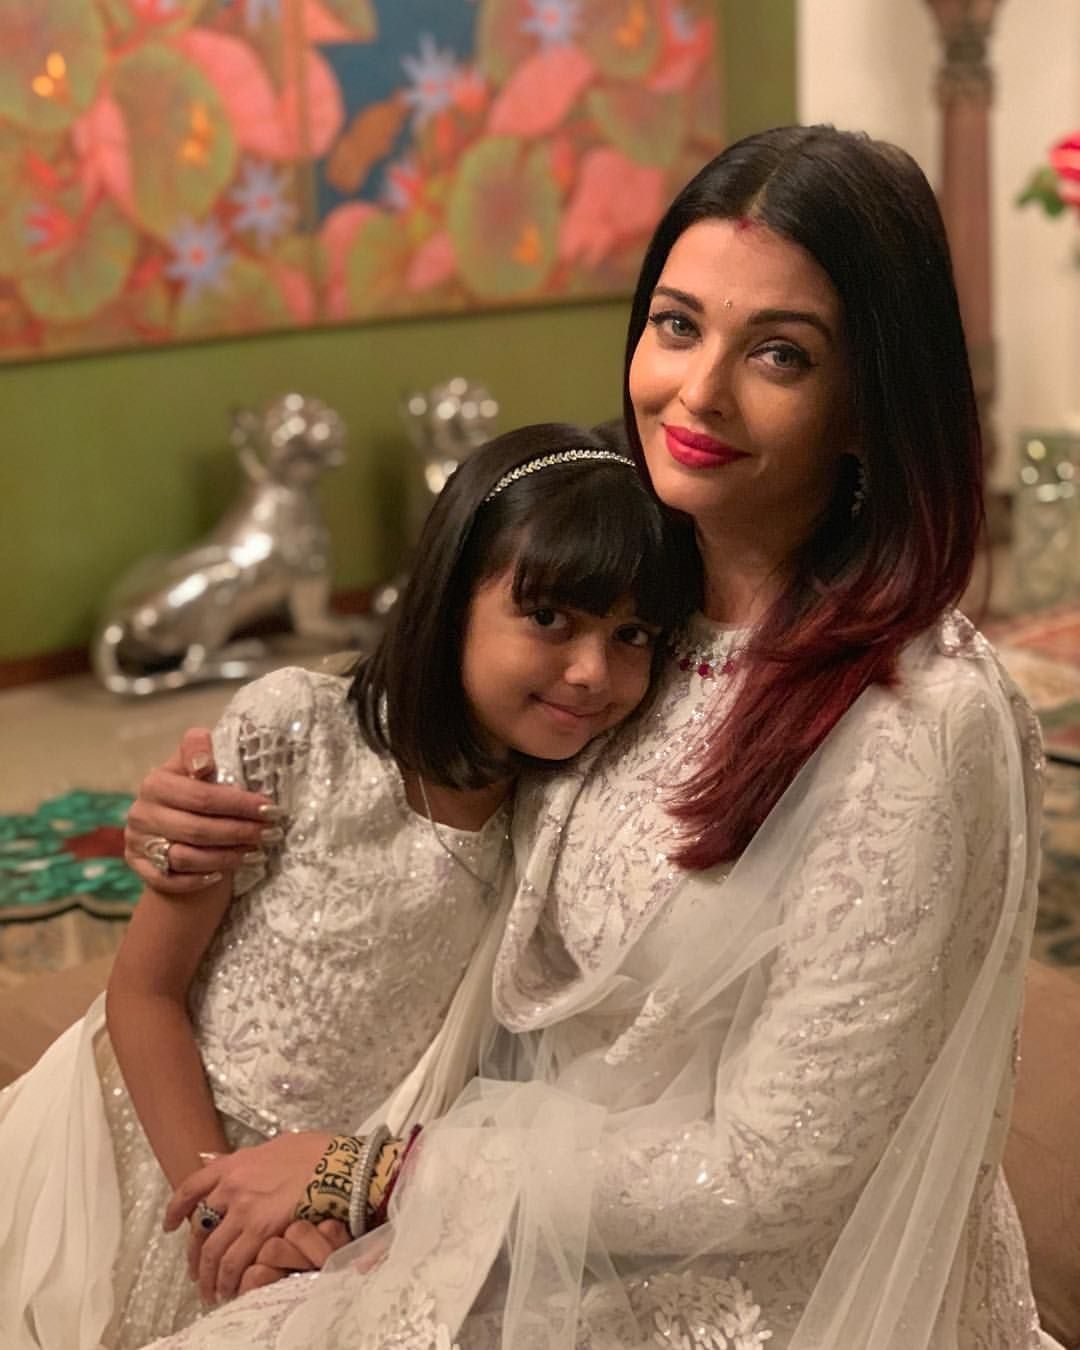 Aishwarya Rai Bachchan Twinning With Her Daughter Aaradhya On Her Birthday Happybirthday Aaradhya Bachchan Deepika Padukone Style Beautiful Actresses